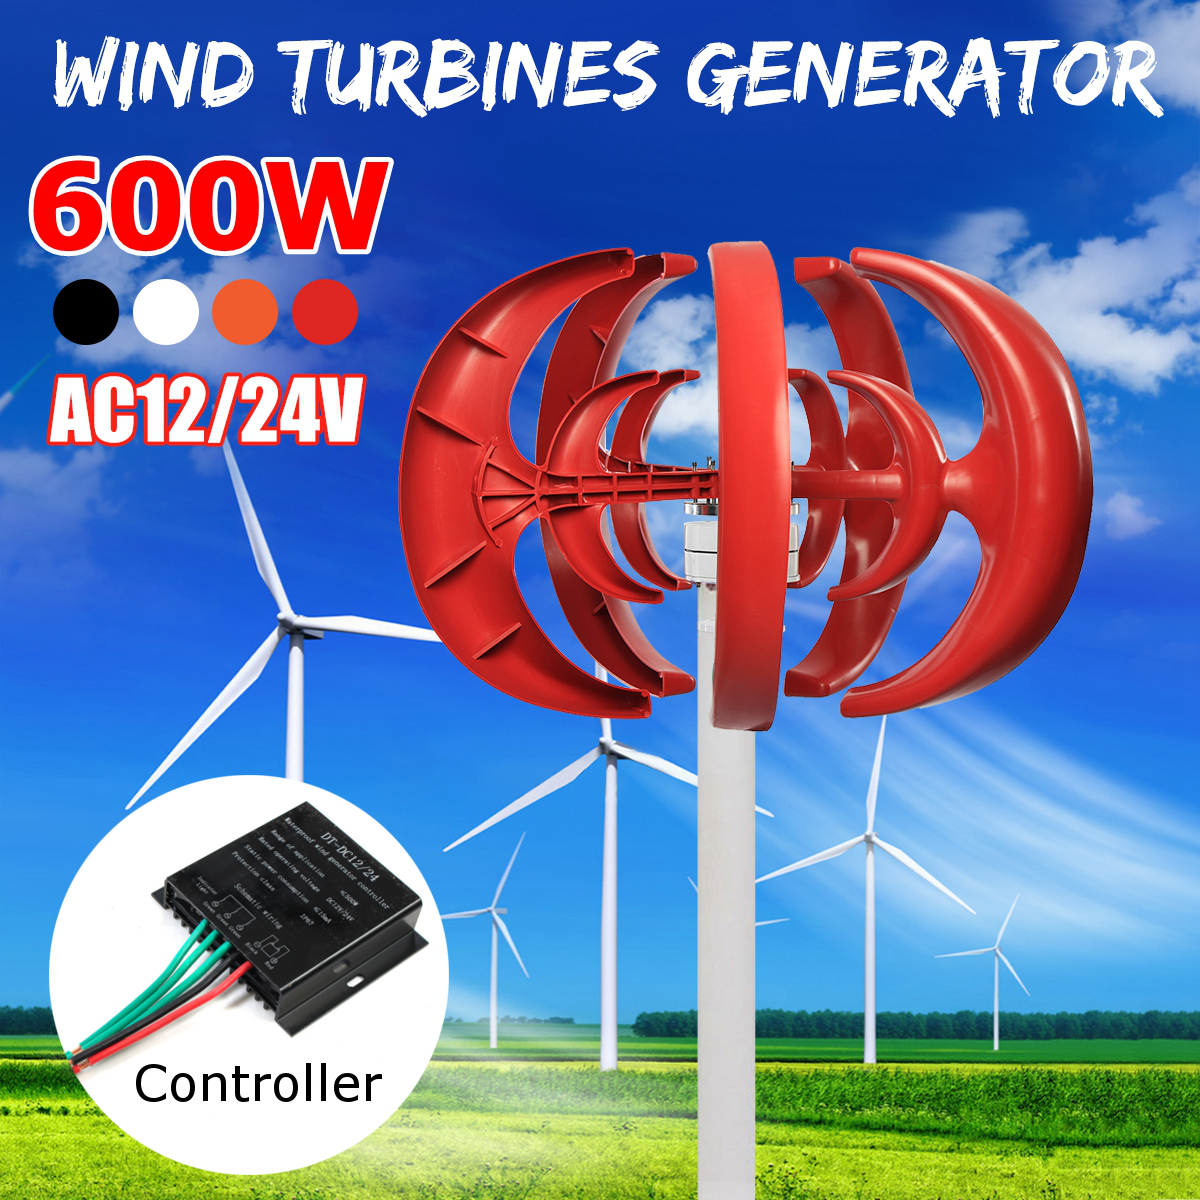 Aerogenerador 600 W 24 V DC 12 V Combine con 600 W inglés controlador de generador de viento hogar para hogar farola híbrida uso